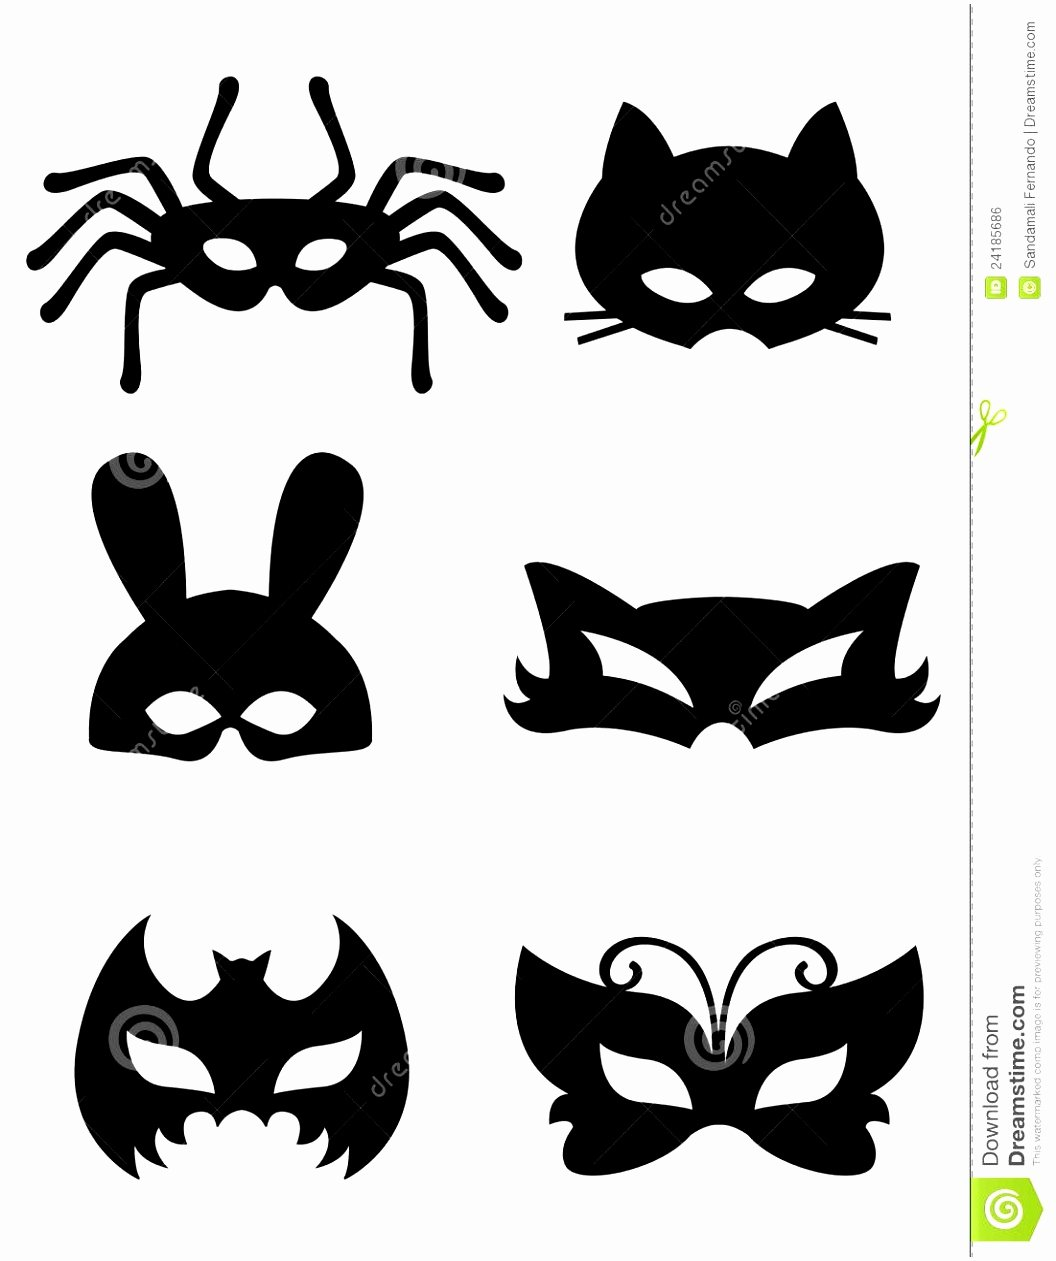 Masquerade Mask Template Printable New 10 Printable Masquerade Masks Templates Ueeoy